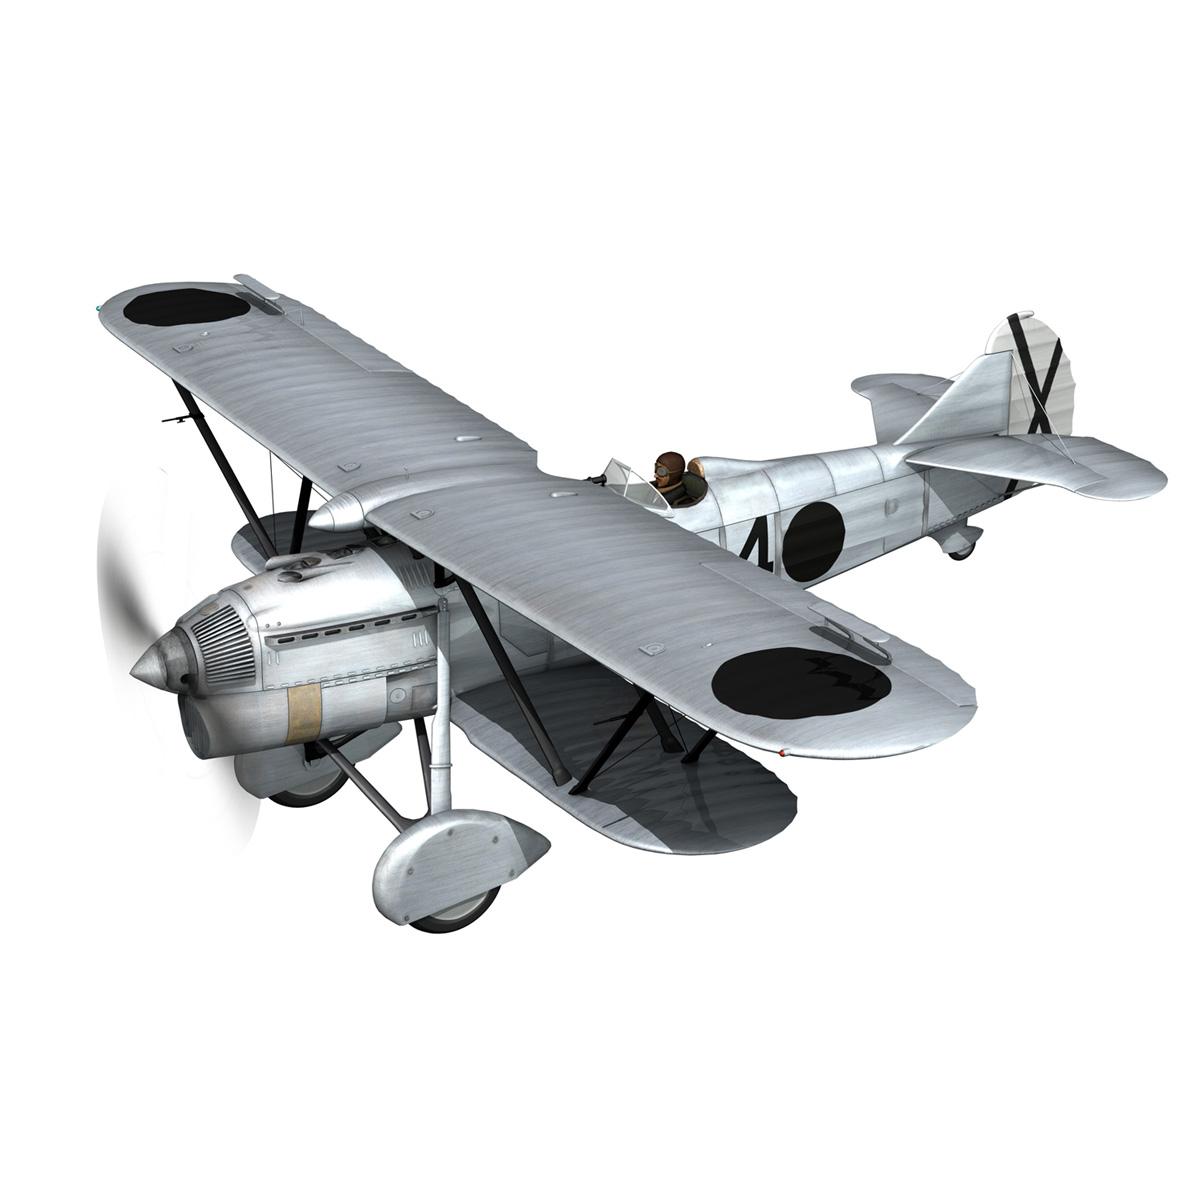 fiat cr.32 – italy air force – gruppo baleari 3d model fbx c4d lwo obj 252212